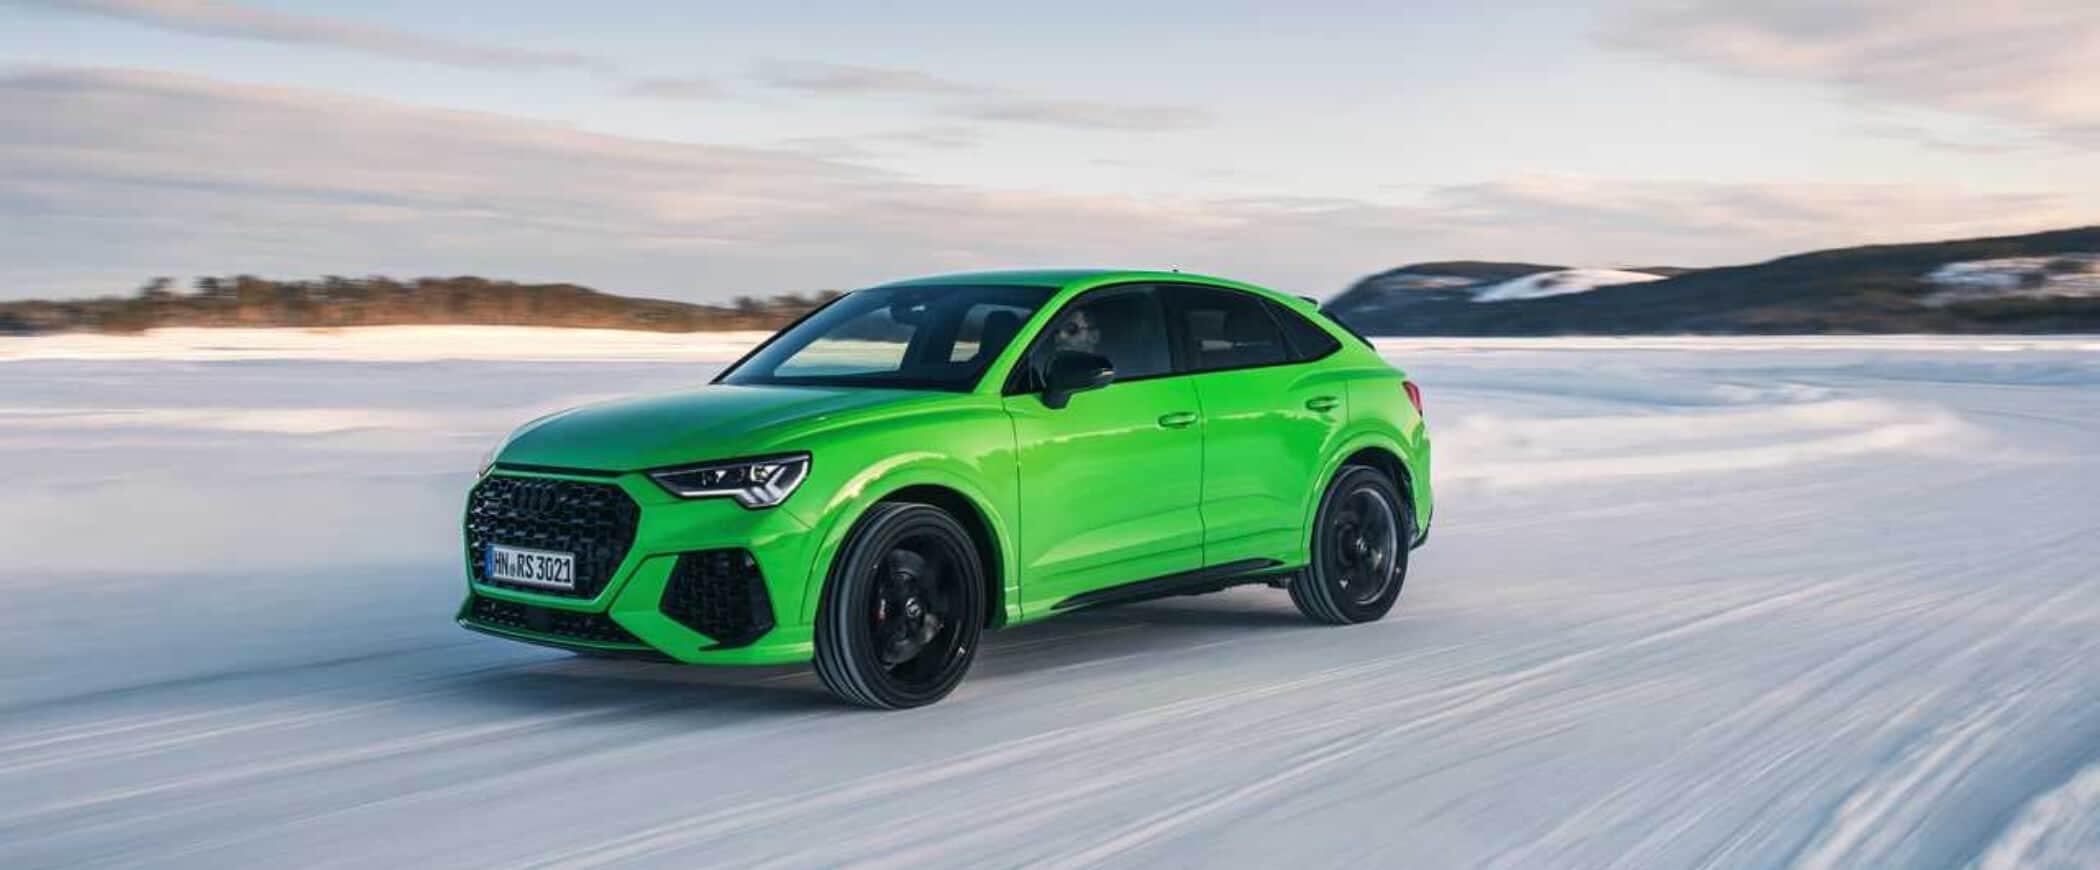 pneumatici invernali su auto verde